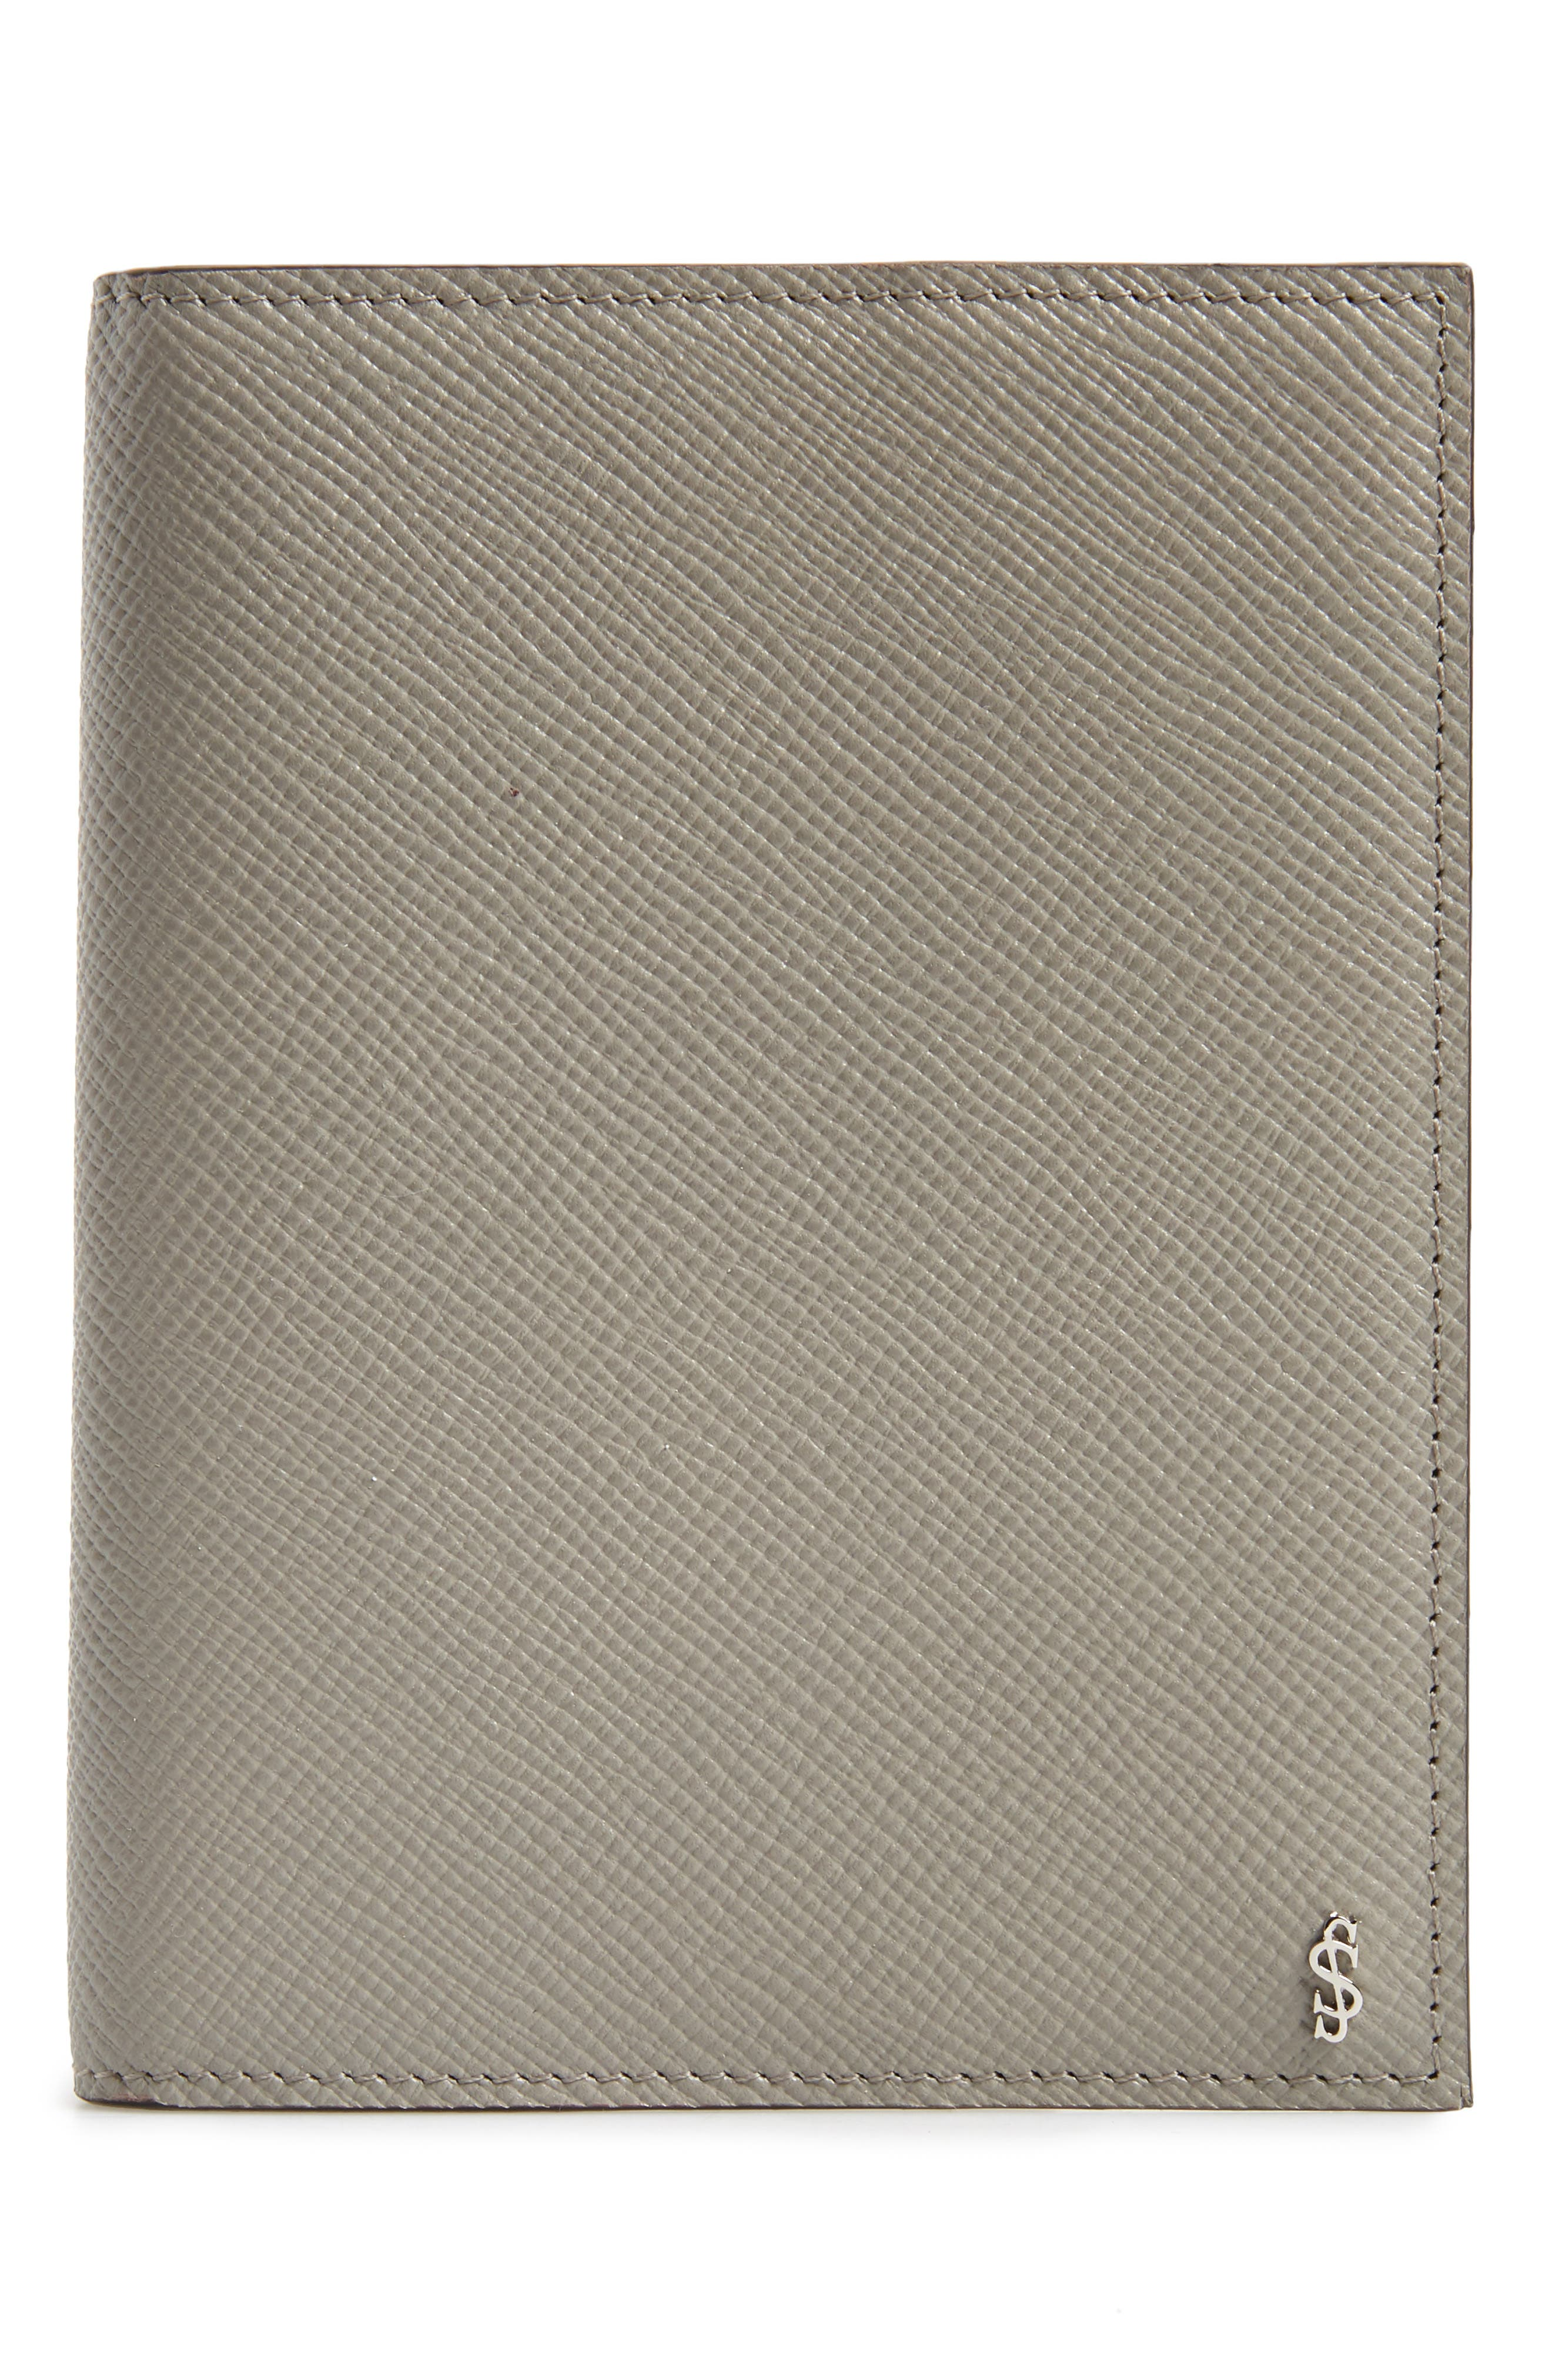 Evolution Leather Passport Case,                             Main thumbnail 1, color,                             020